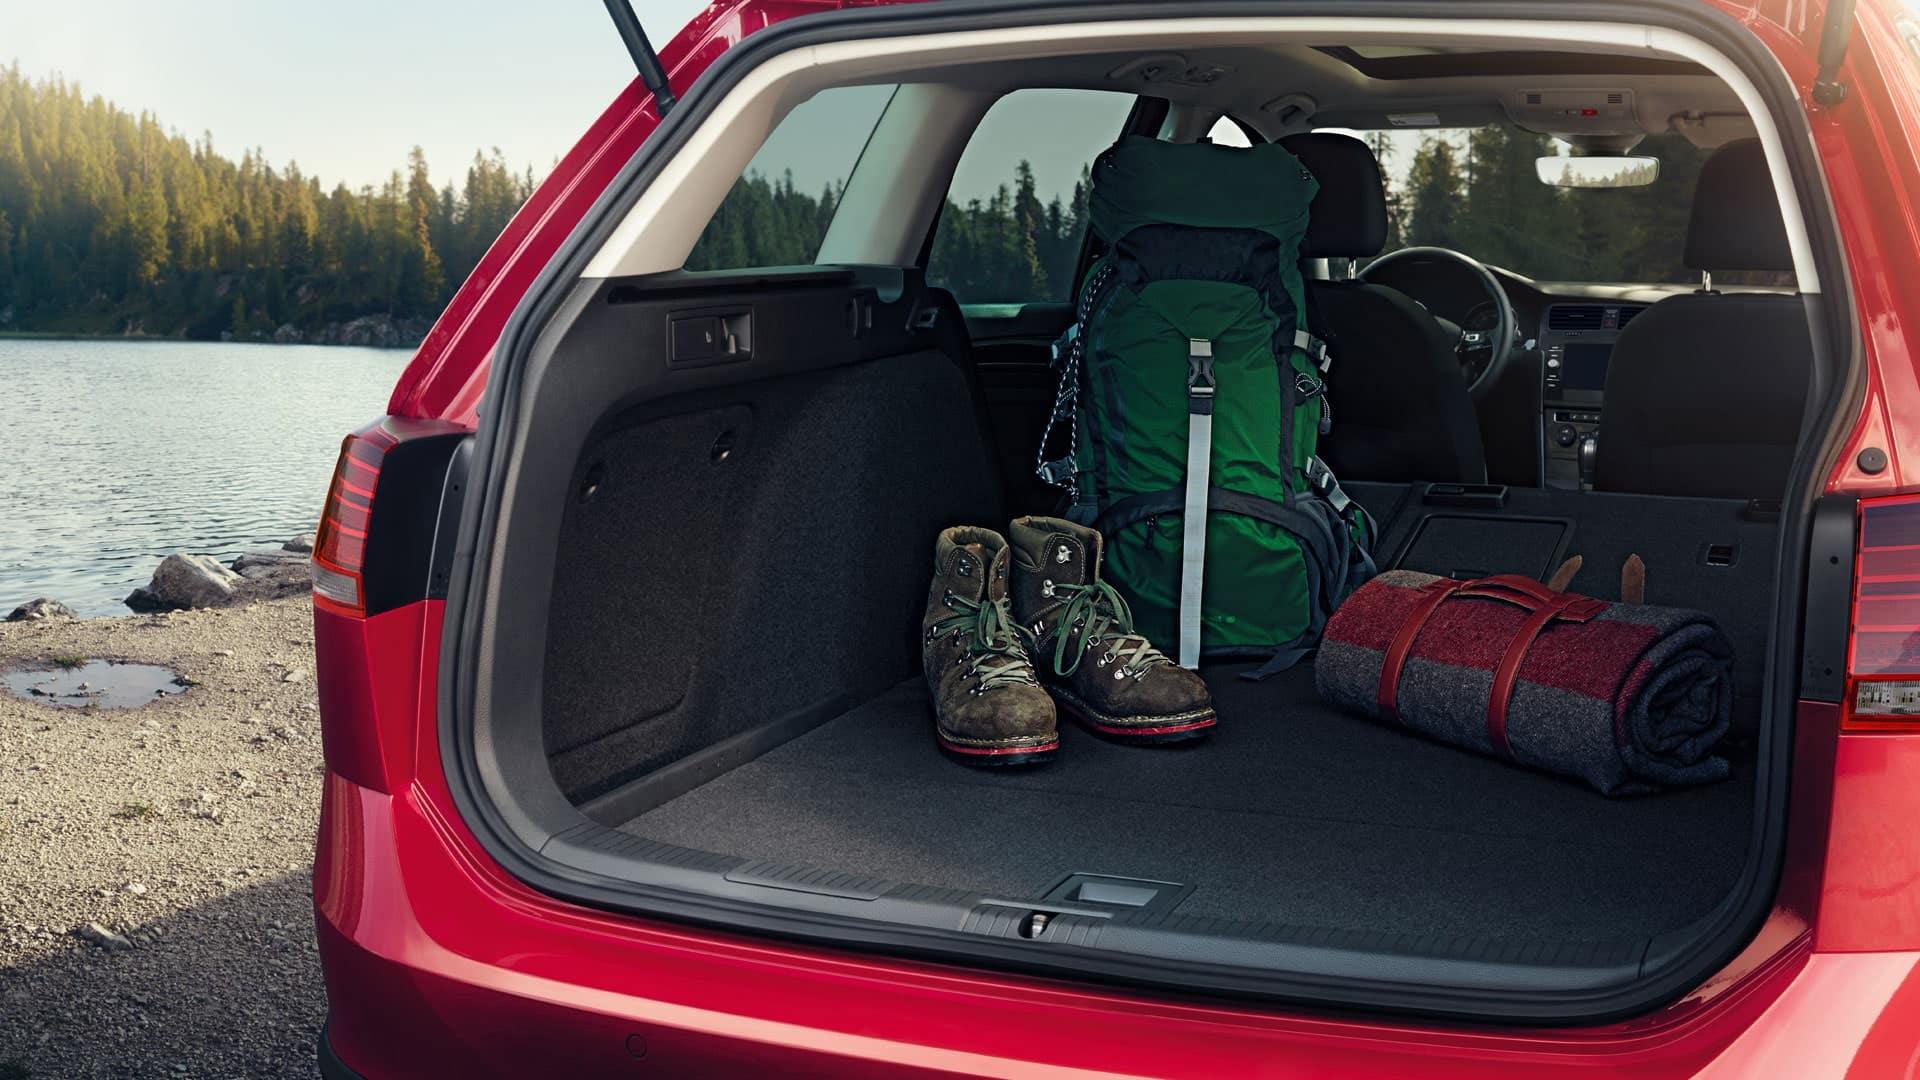 Camping gear in a red 2019 VW Golf Alltrack